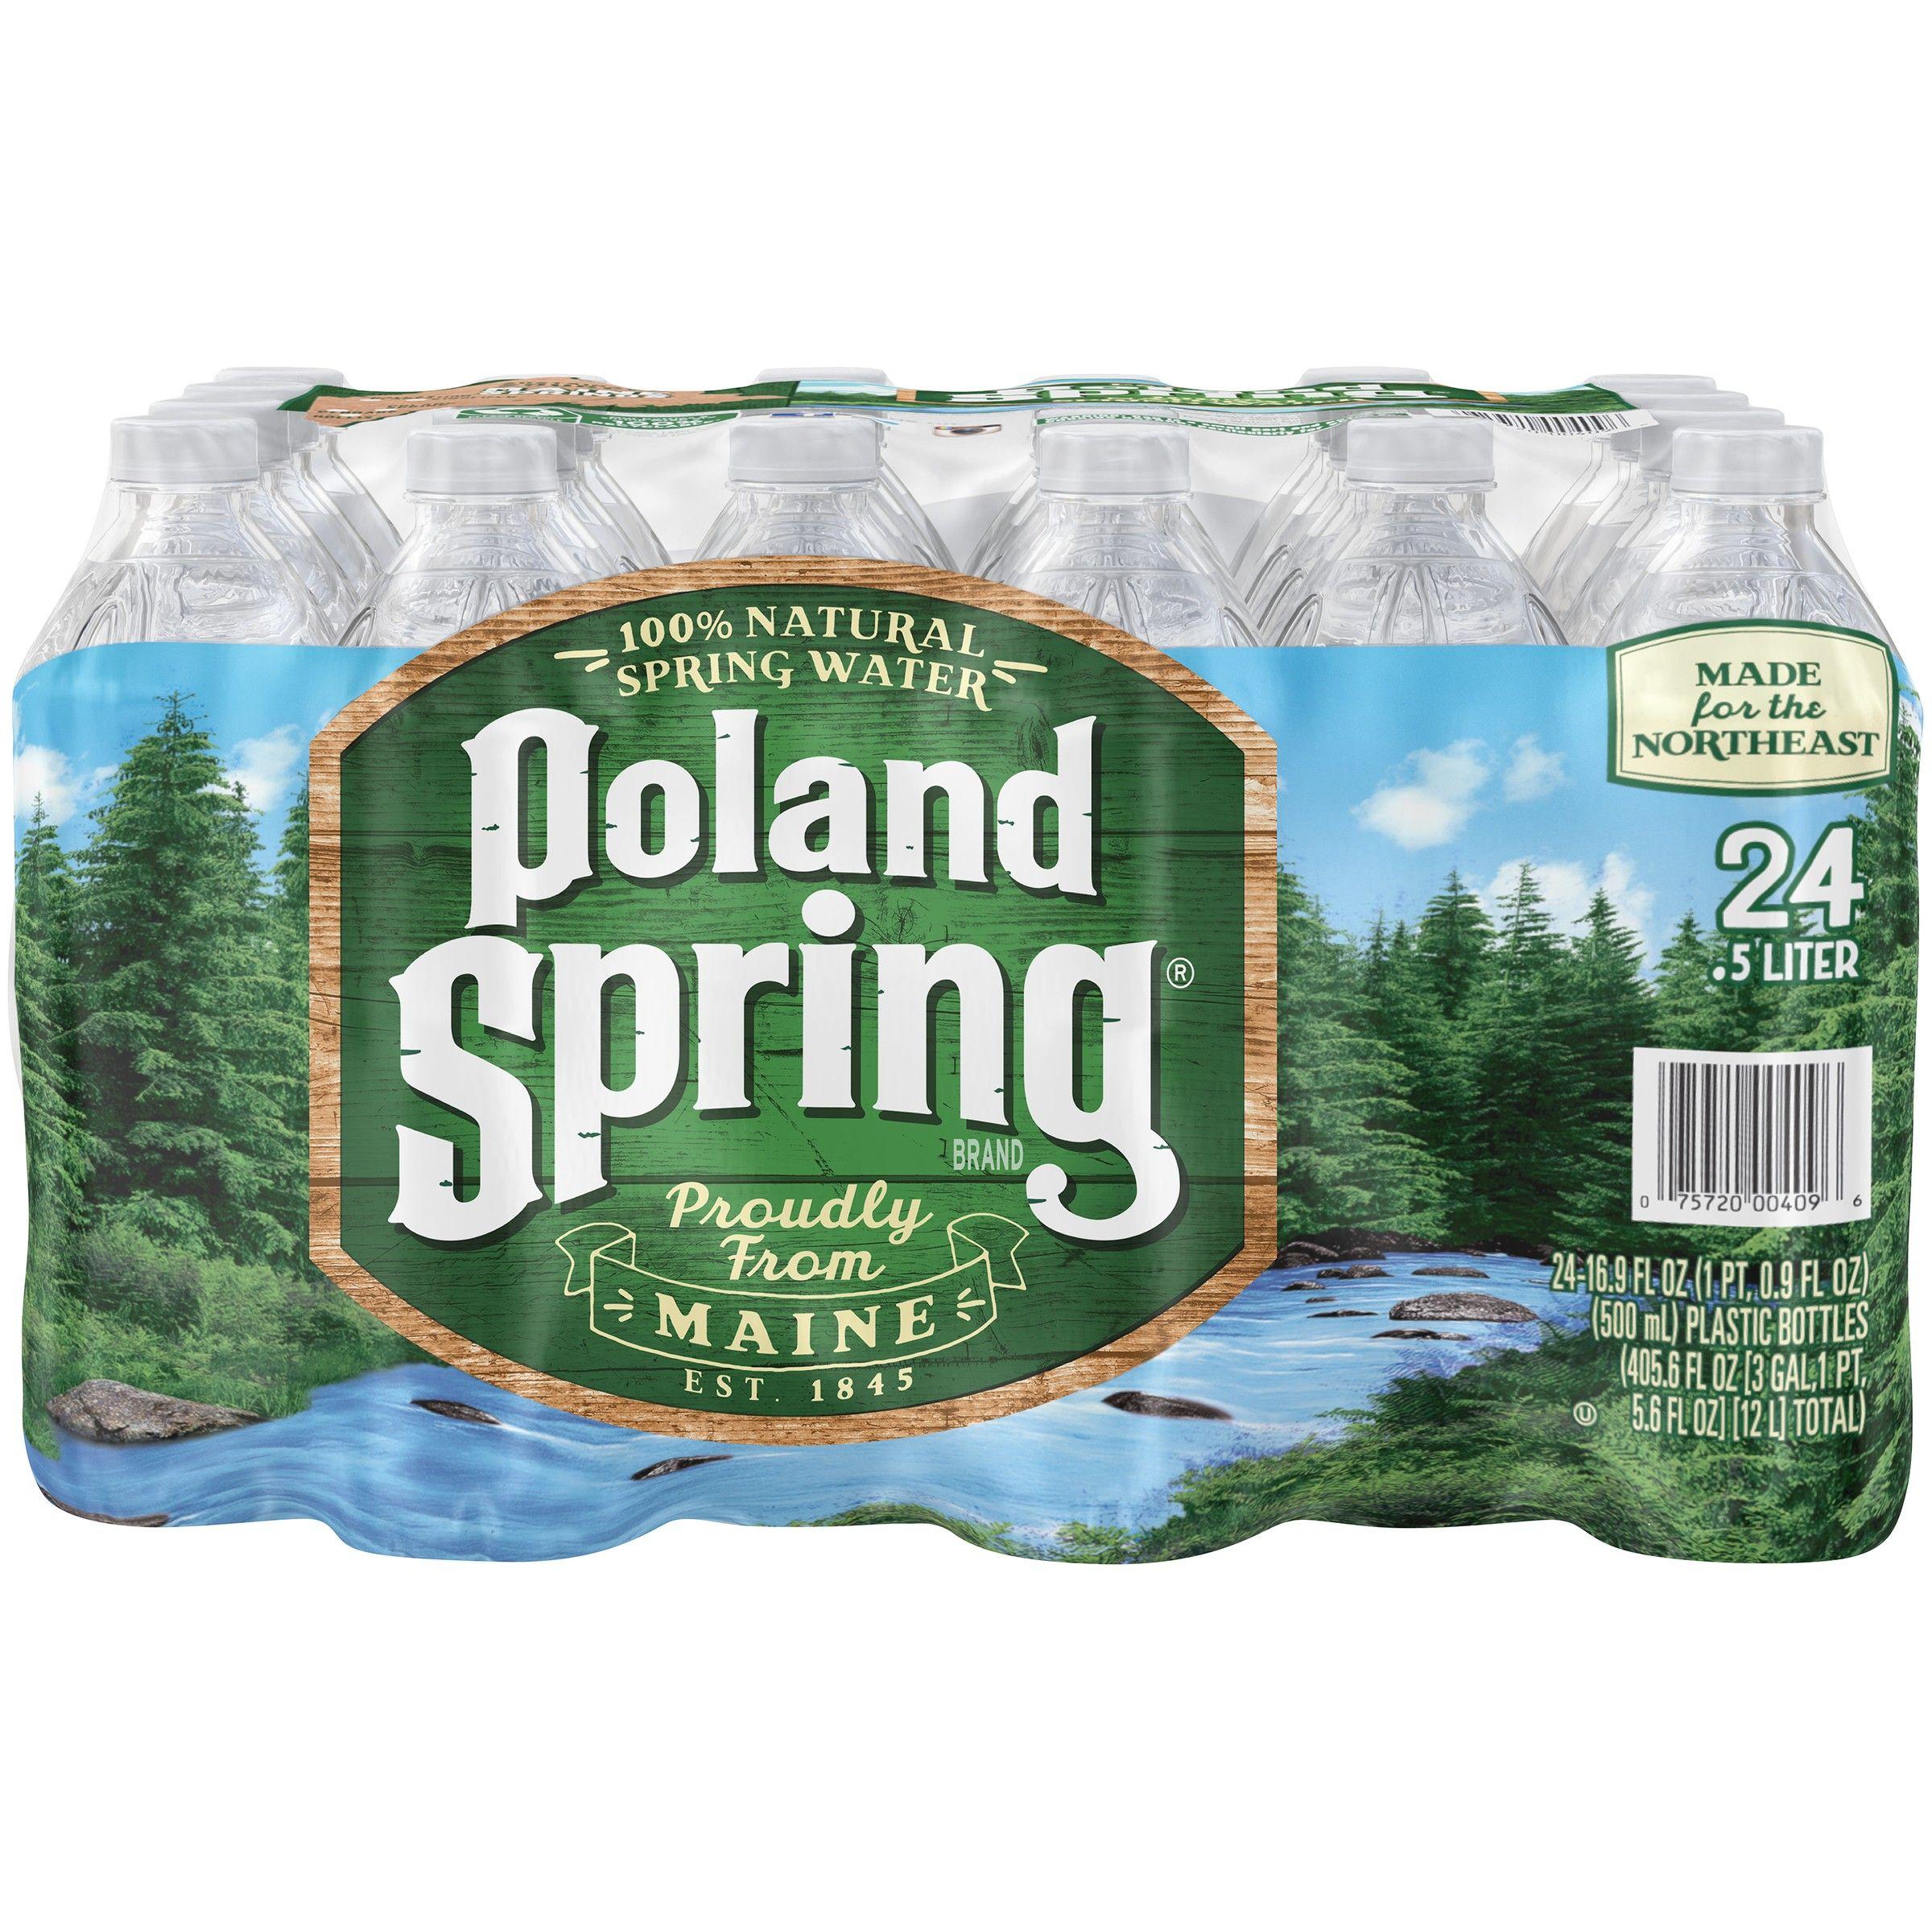 Food Poland spring water, Natural spring water, Spring water